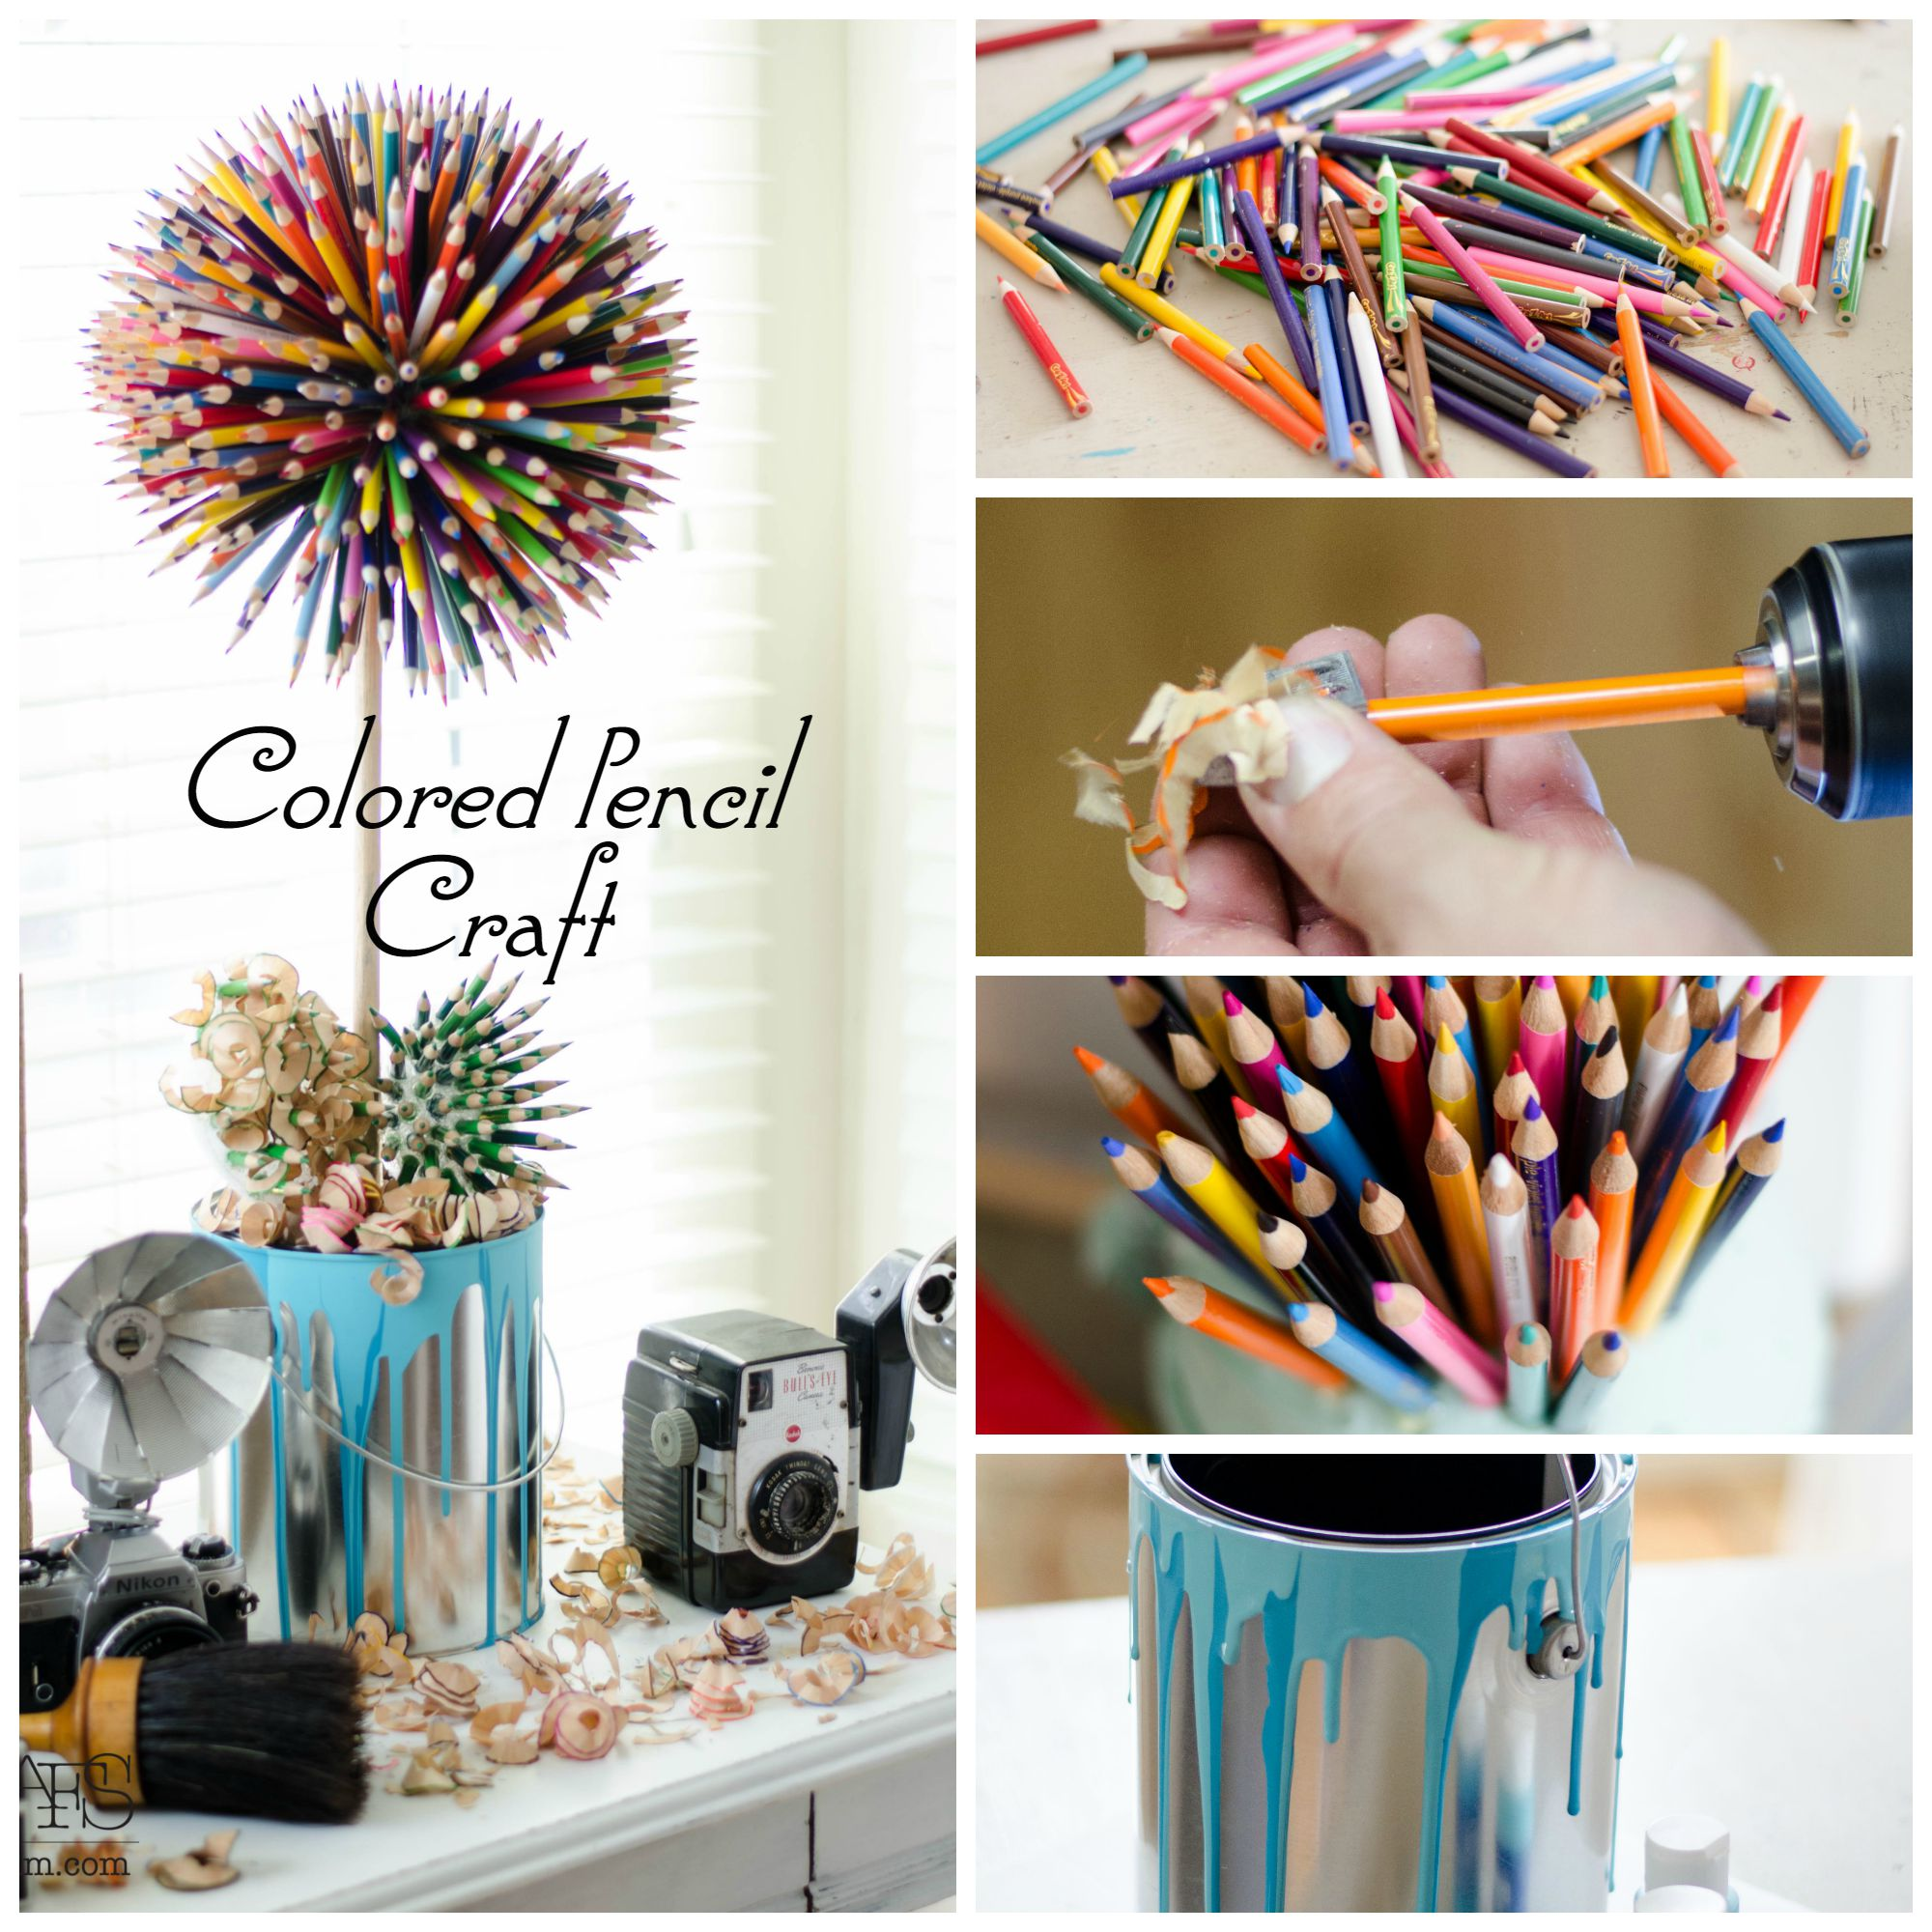 15+ Impressionantes Manualidades Reutilizando Lápices de Colores